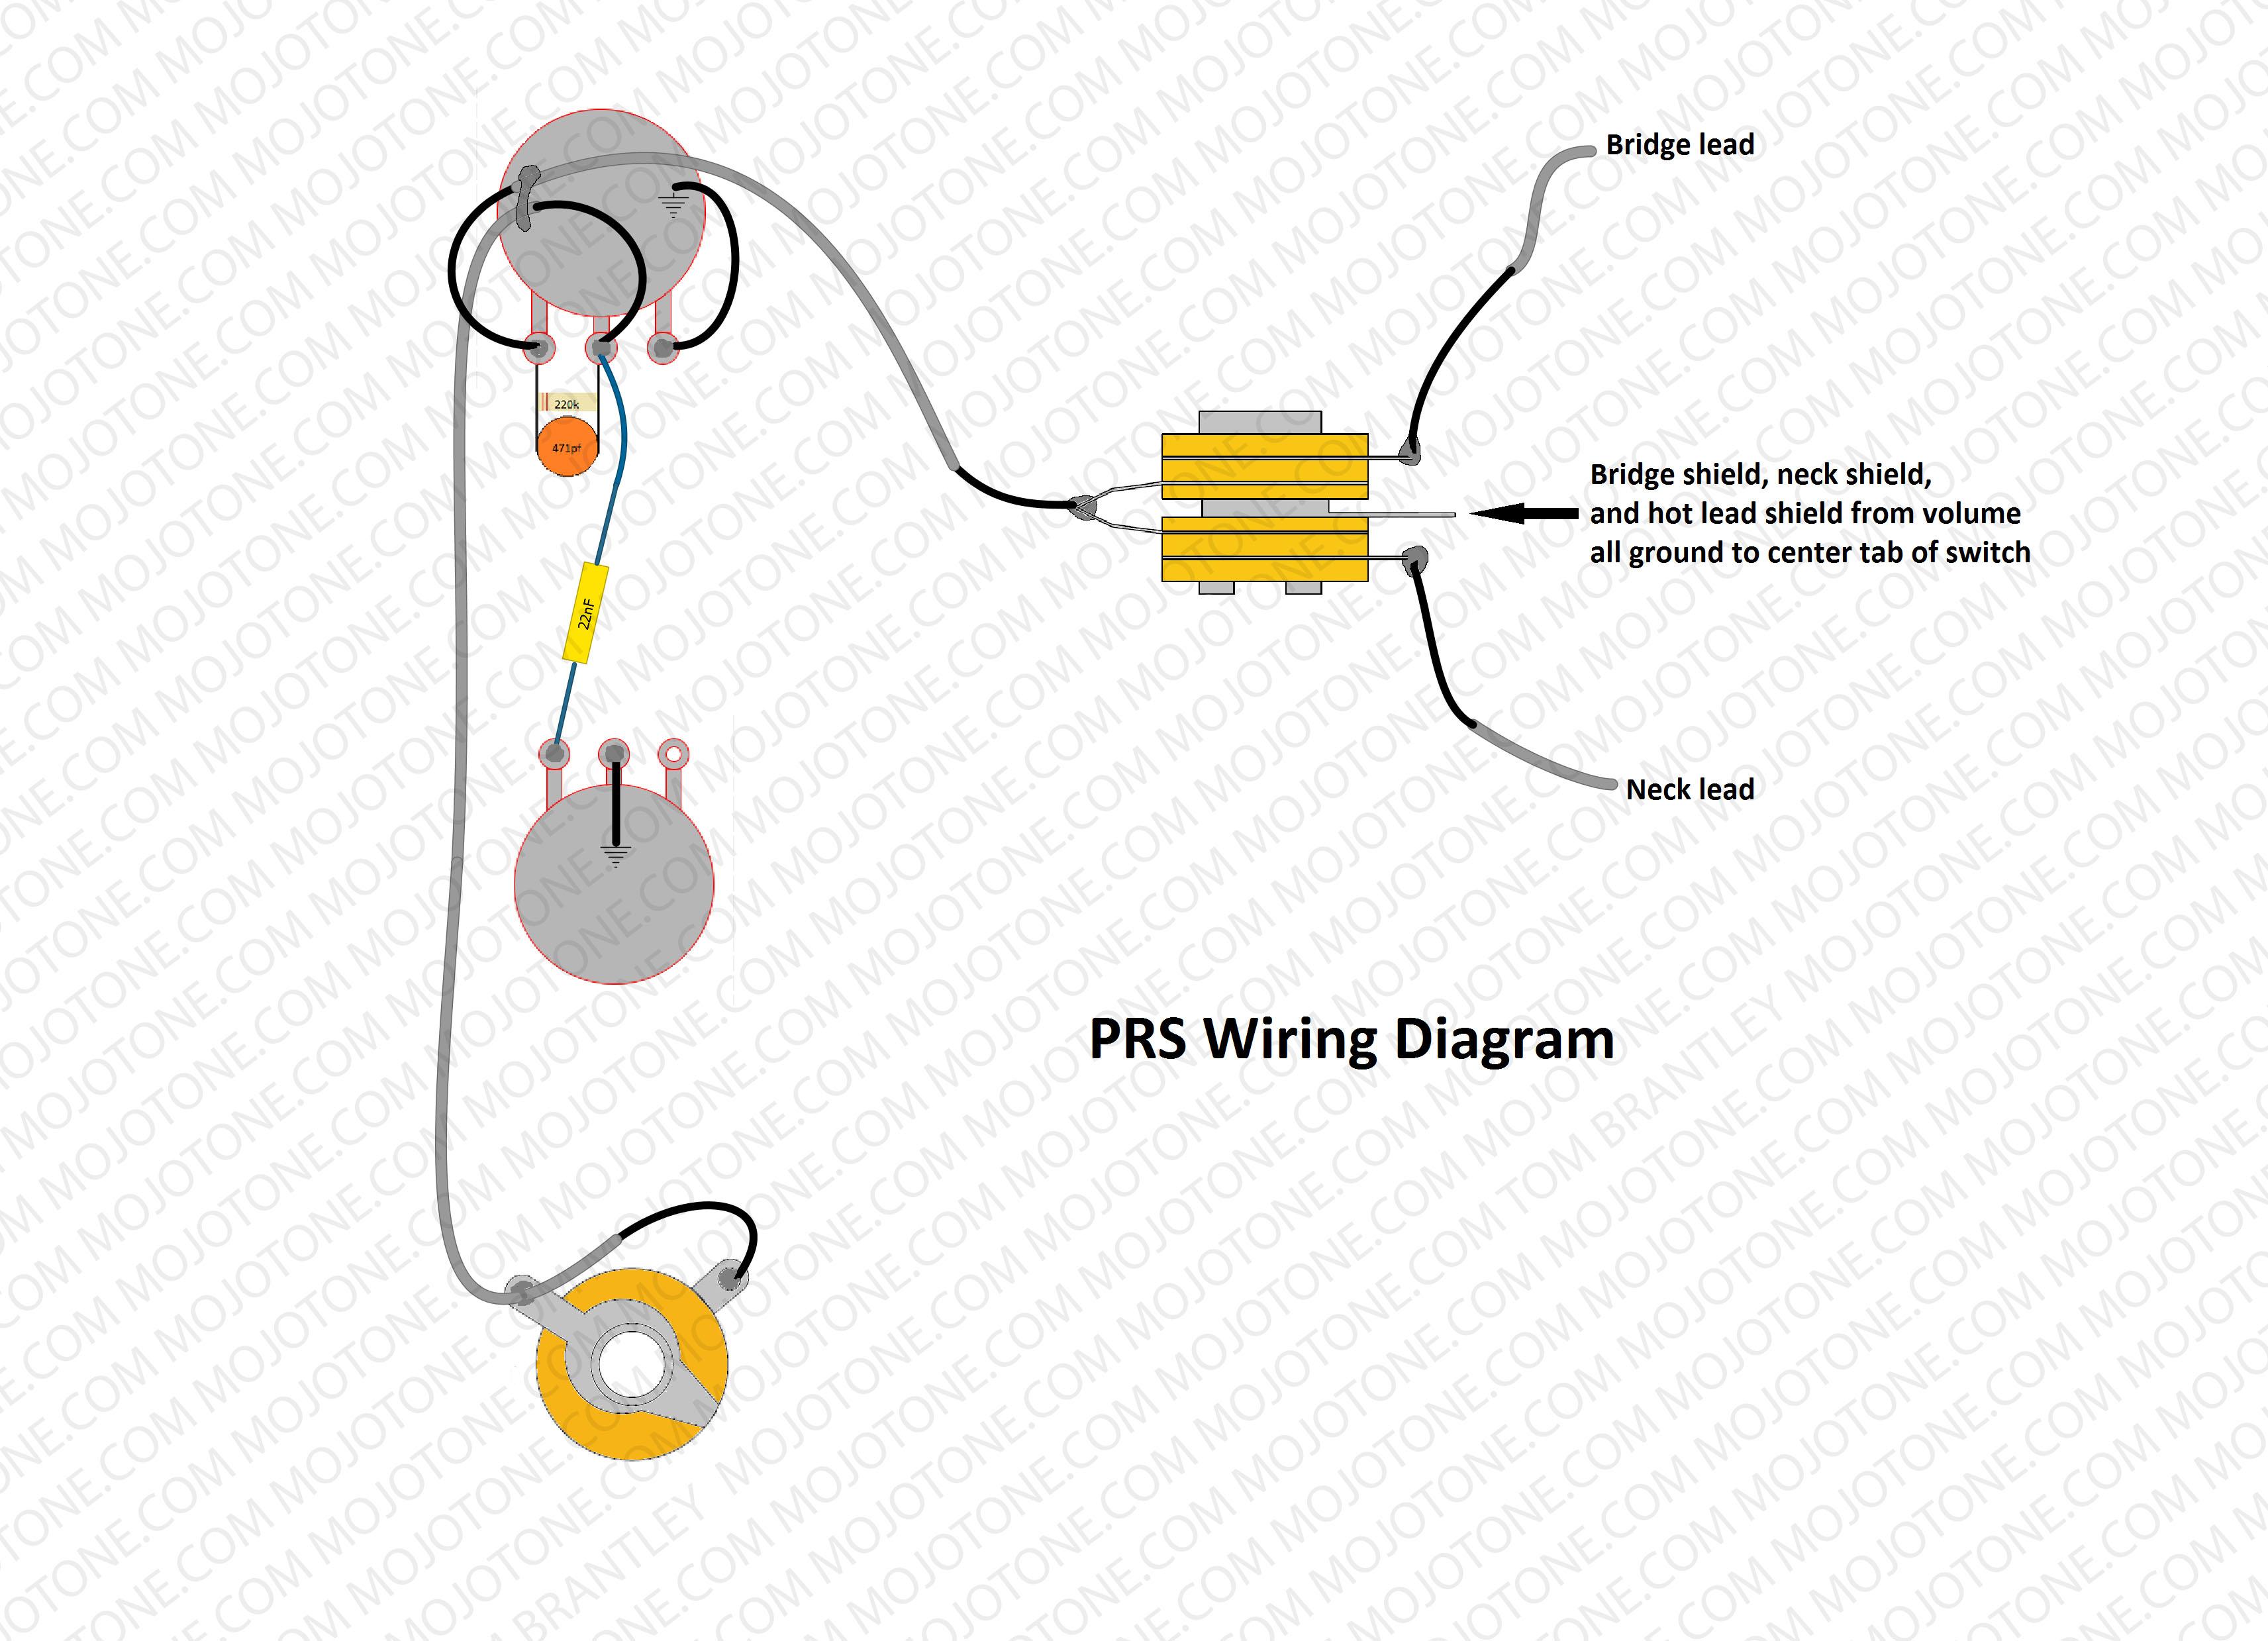 Prs Wiring Diagram - Prs Wiring Diagram